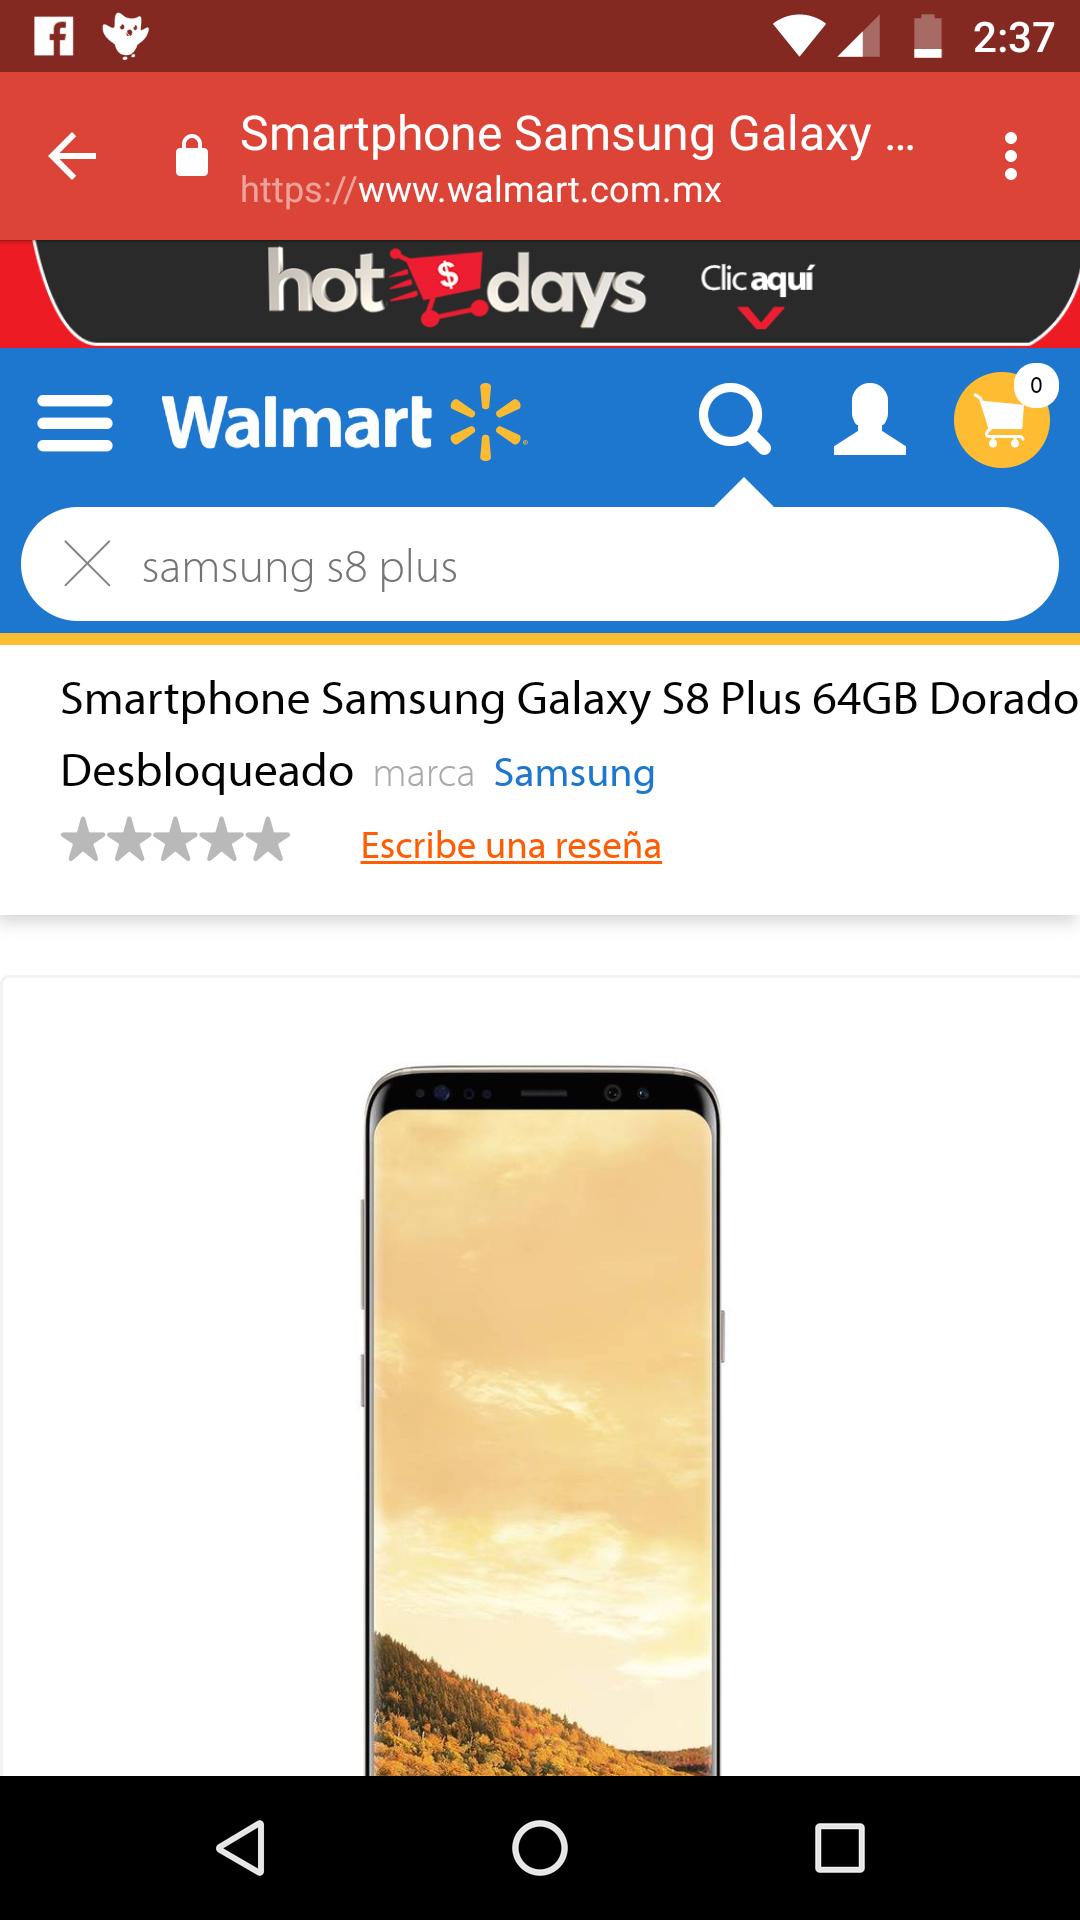 Hot Sale 2018 Walmart:  S8 Plus desbloqueado. 11500 bbva, 11800 Banamex.